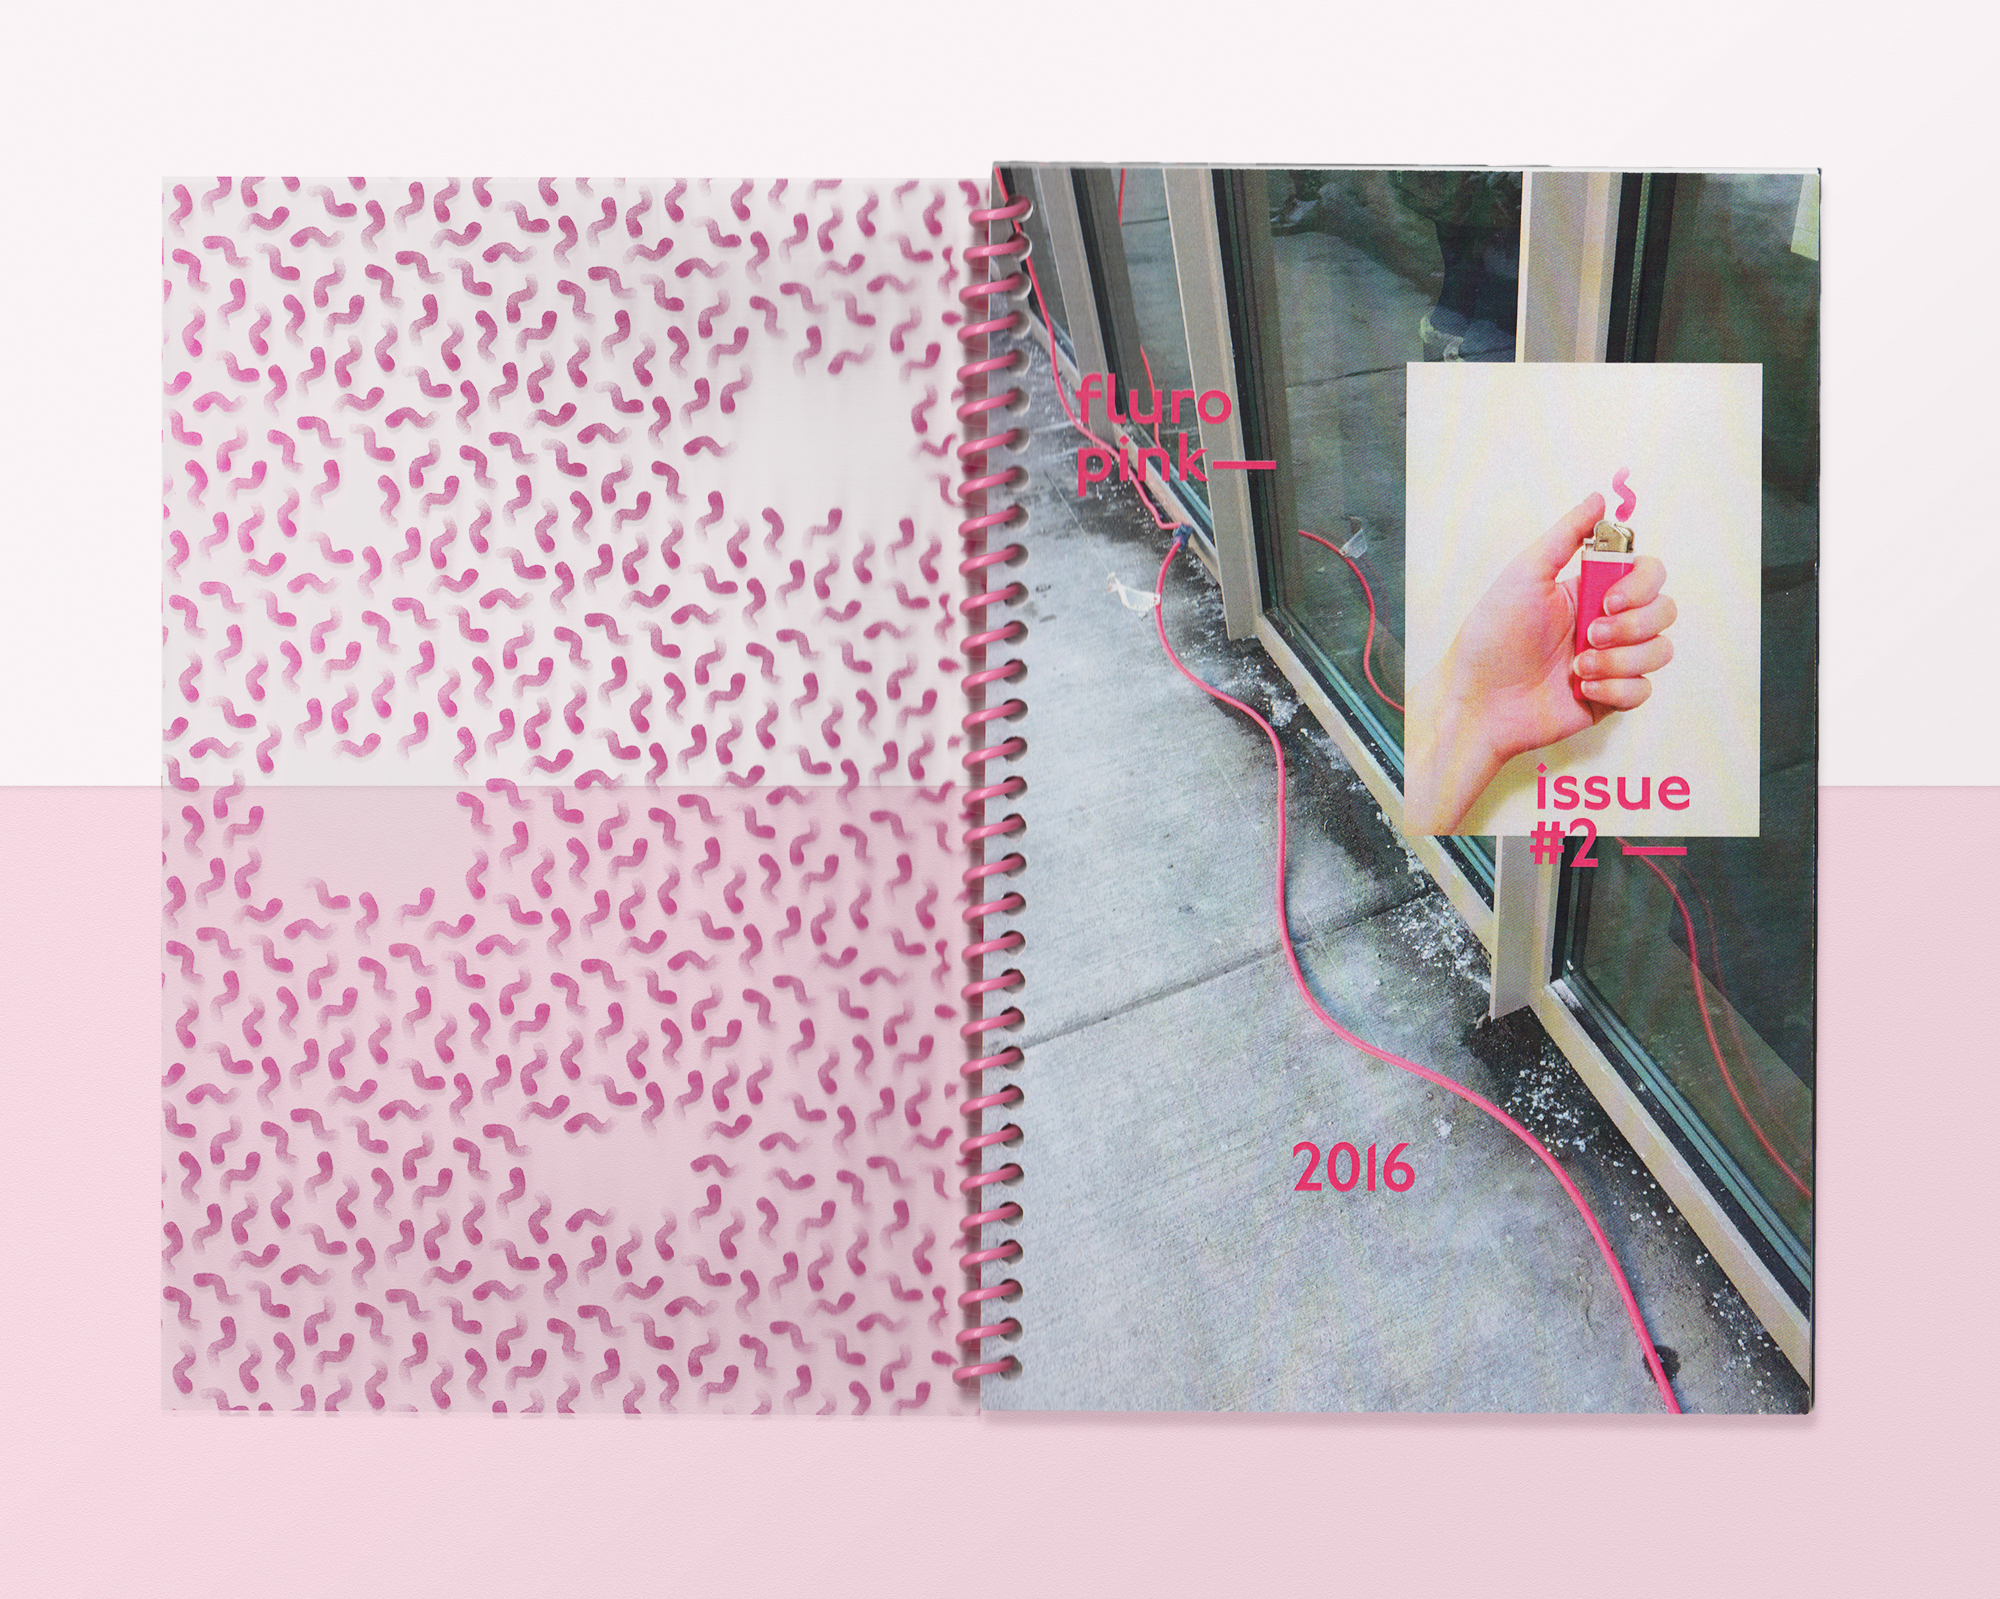 Chris_Chew_Fluro_Pink_2_cover2.jpg